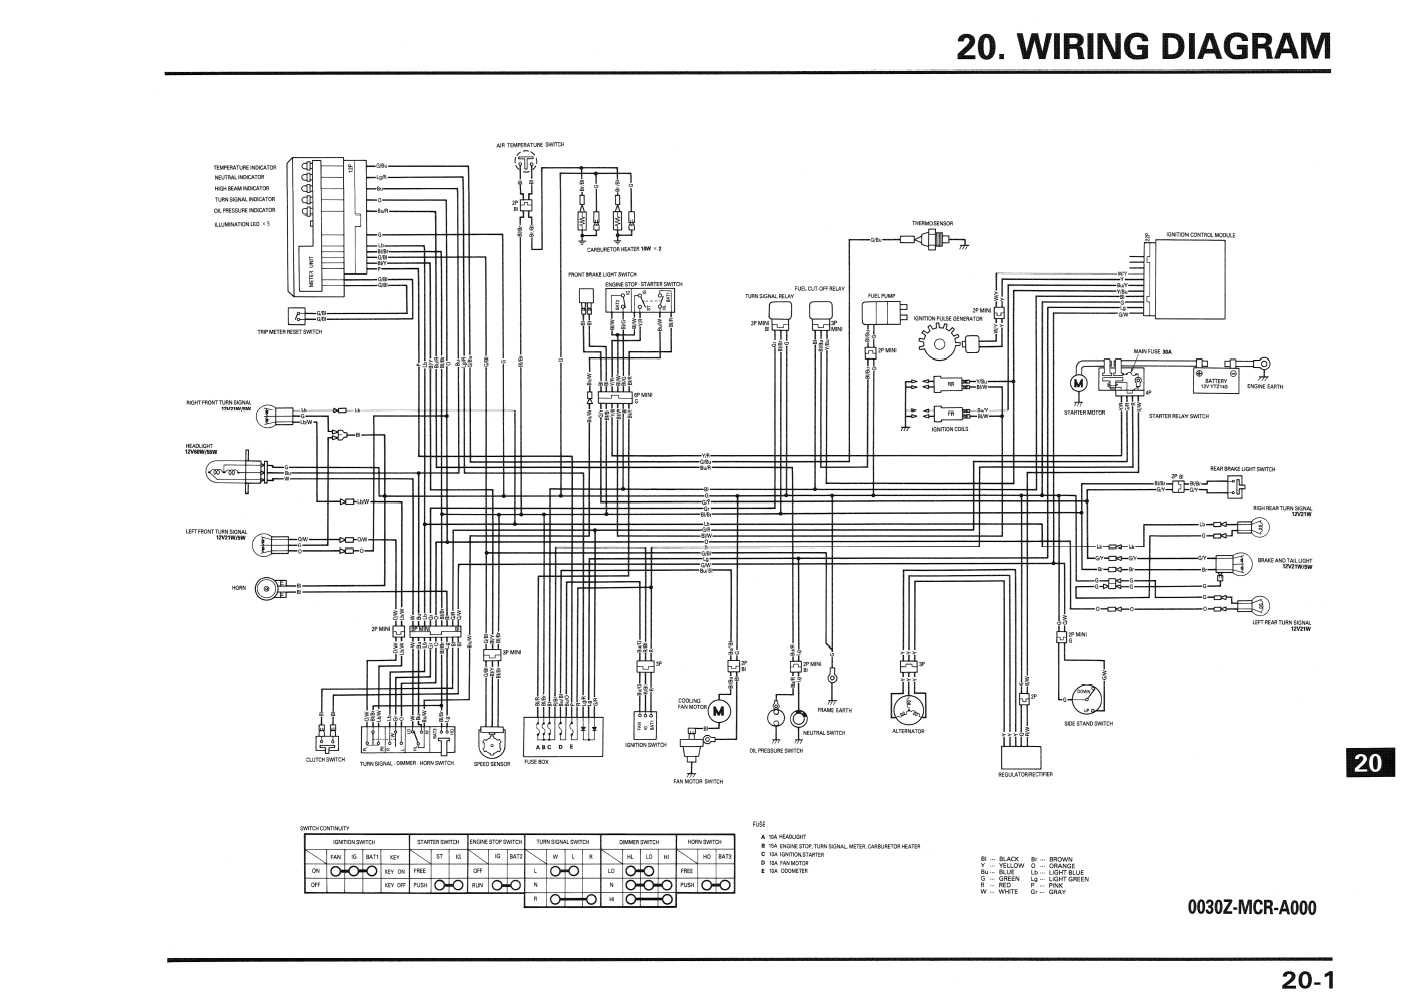 motorcycle honda shadow wiring diagram 2000 mitsubishi montero electrical problem page 2 forums